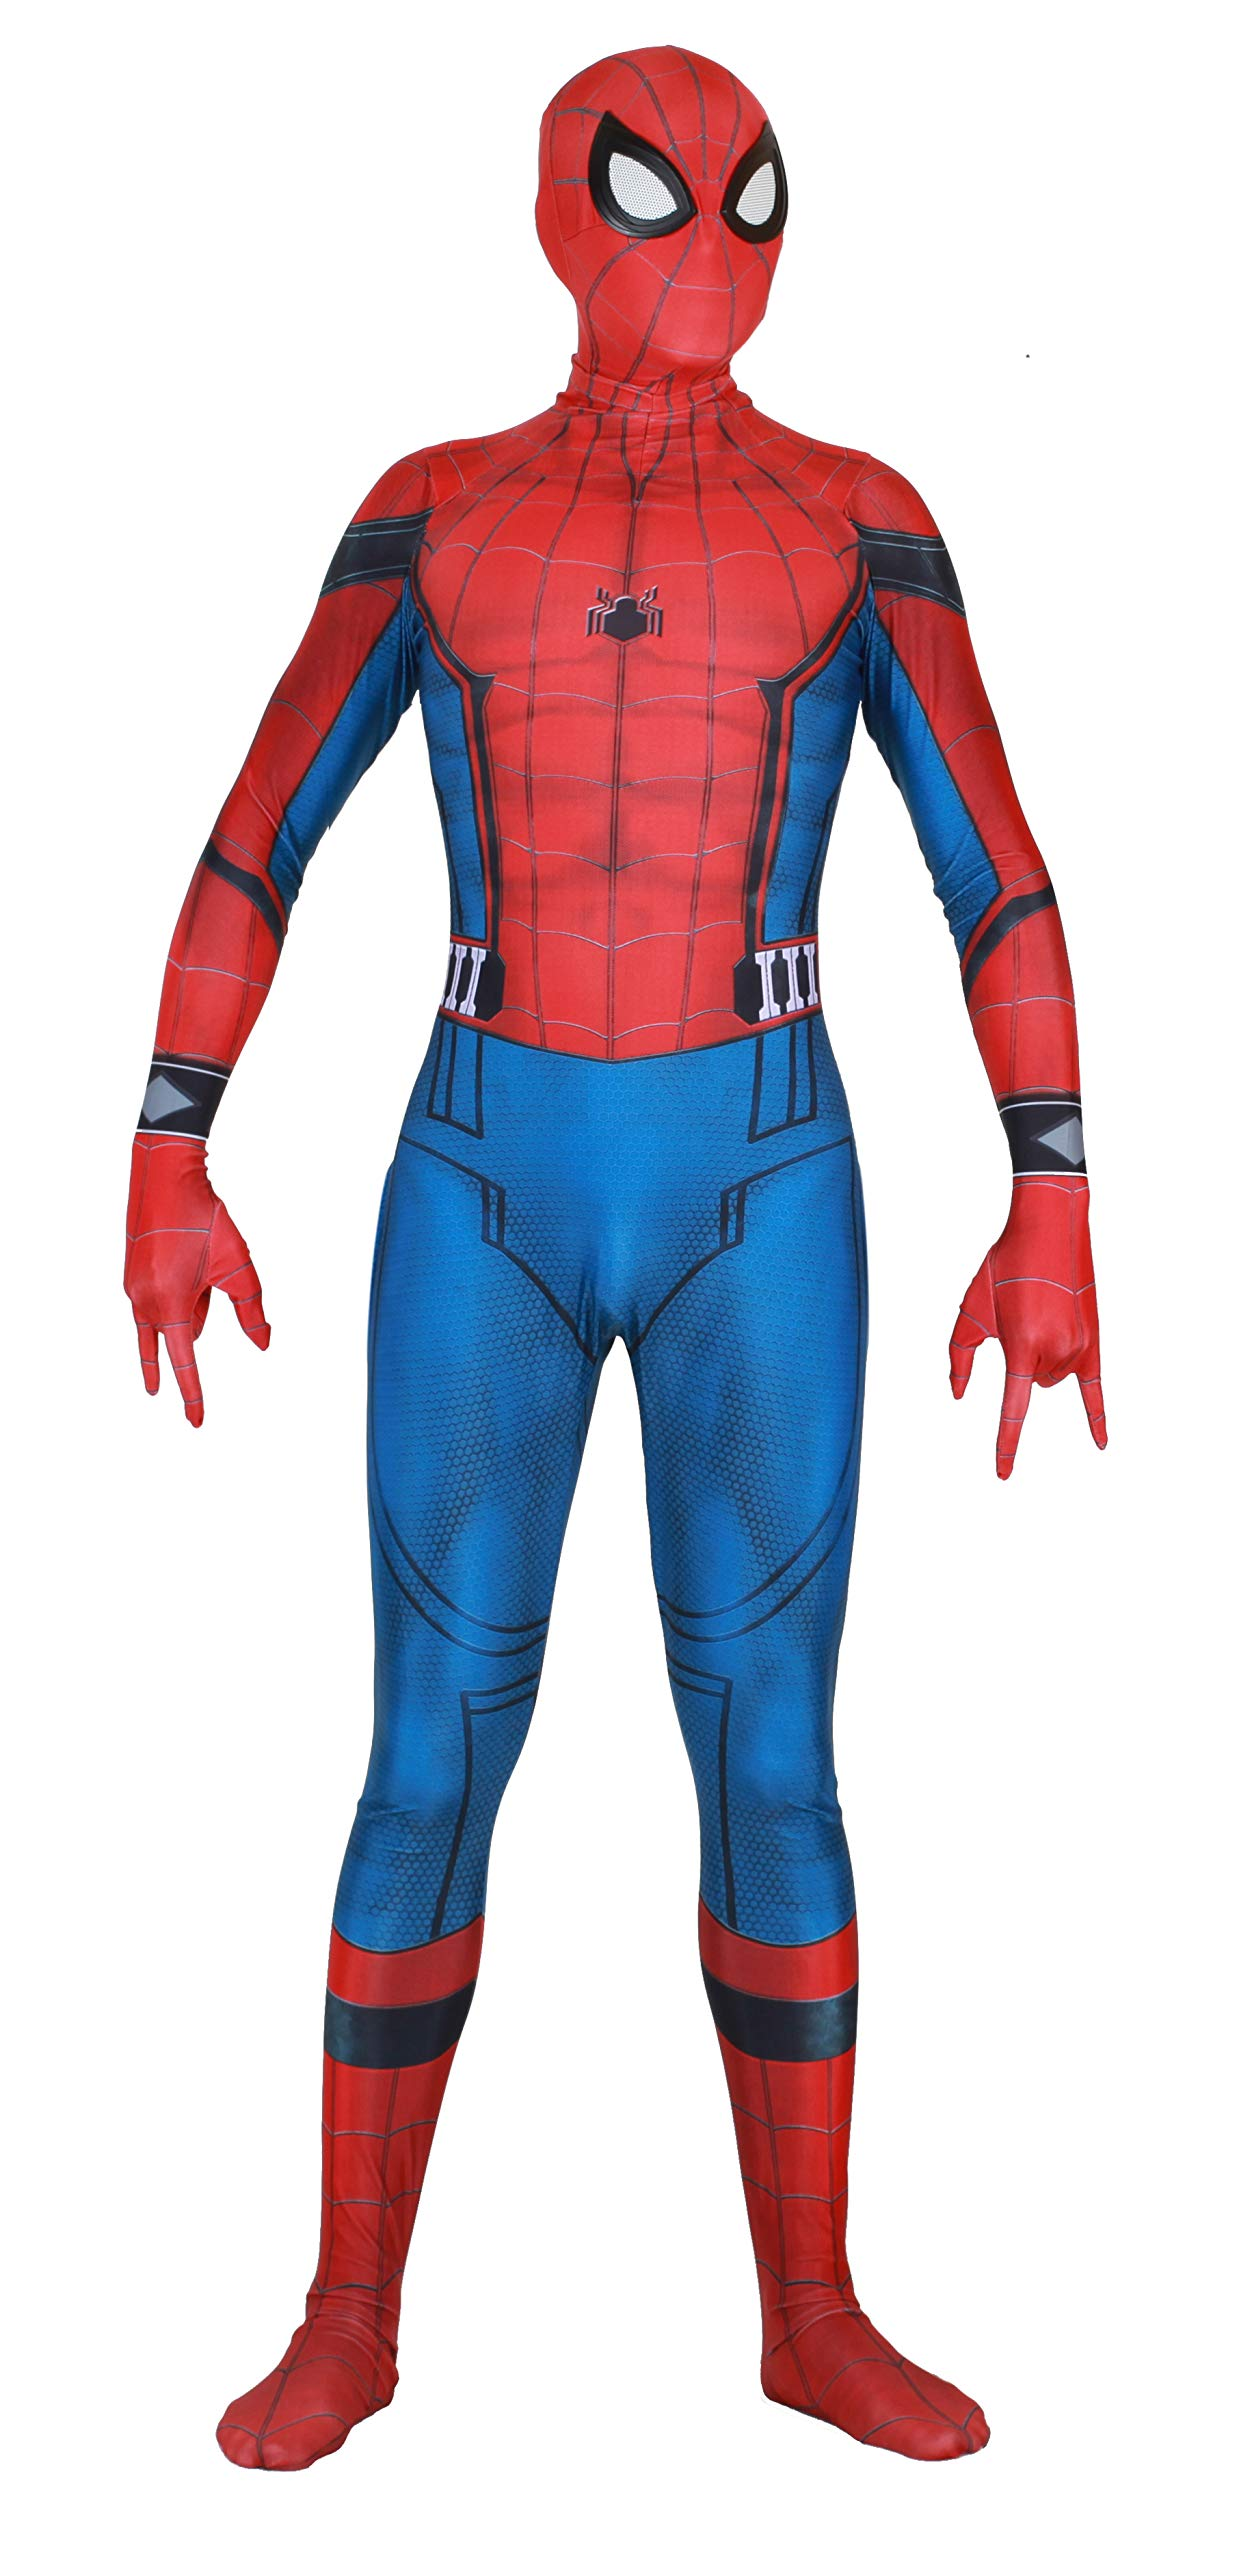 - 715KL4lqUpL - Riekinc Unisex Lycra Spandex Bodysuit Audlt Kids Halloween Cosplay Costume